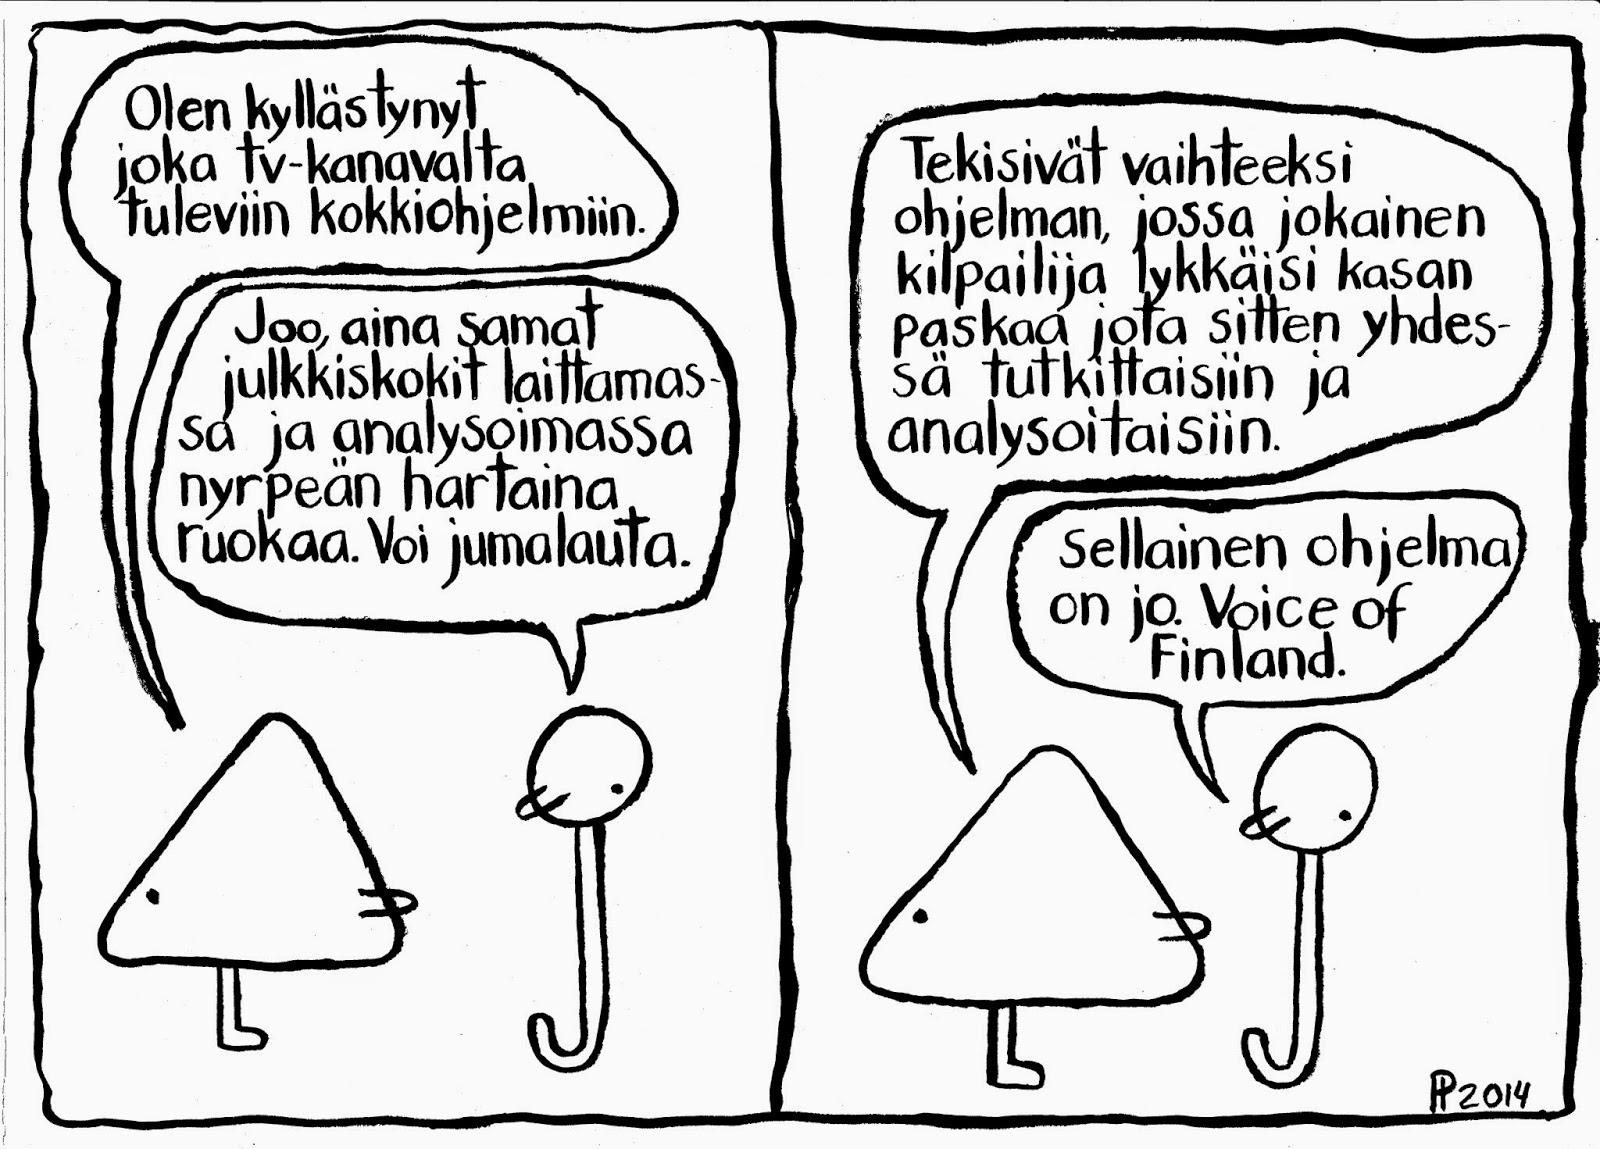 hauska vitsi Tampere